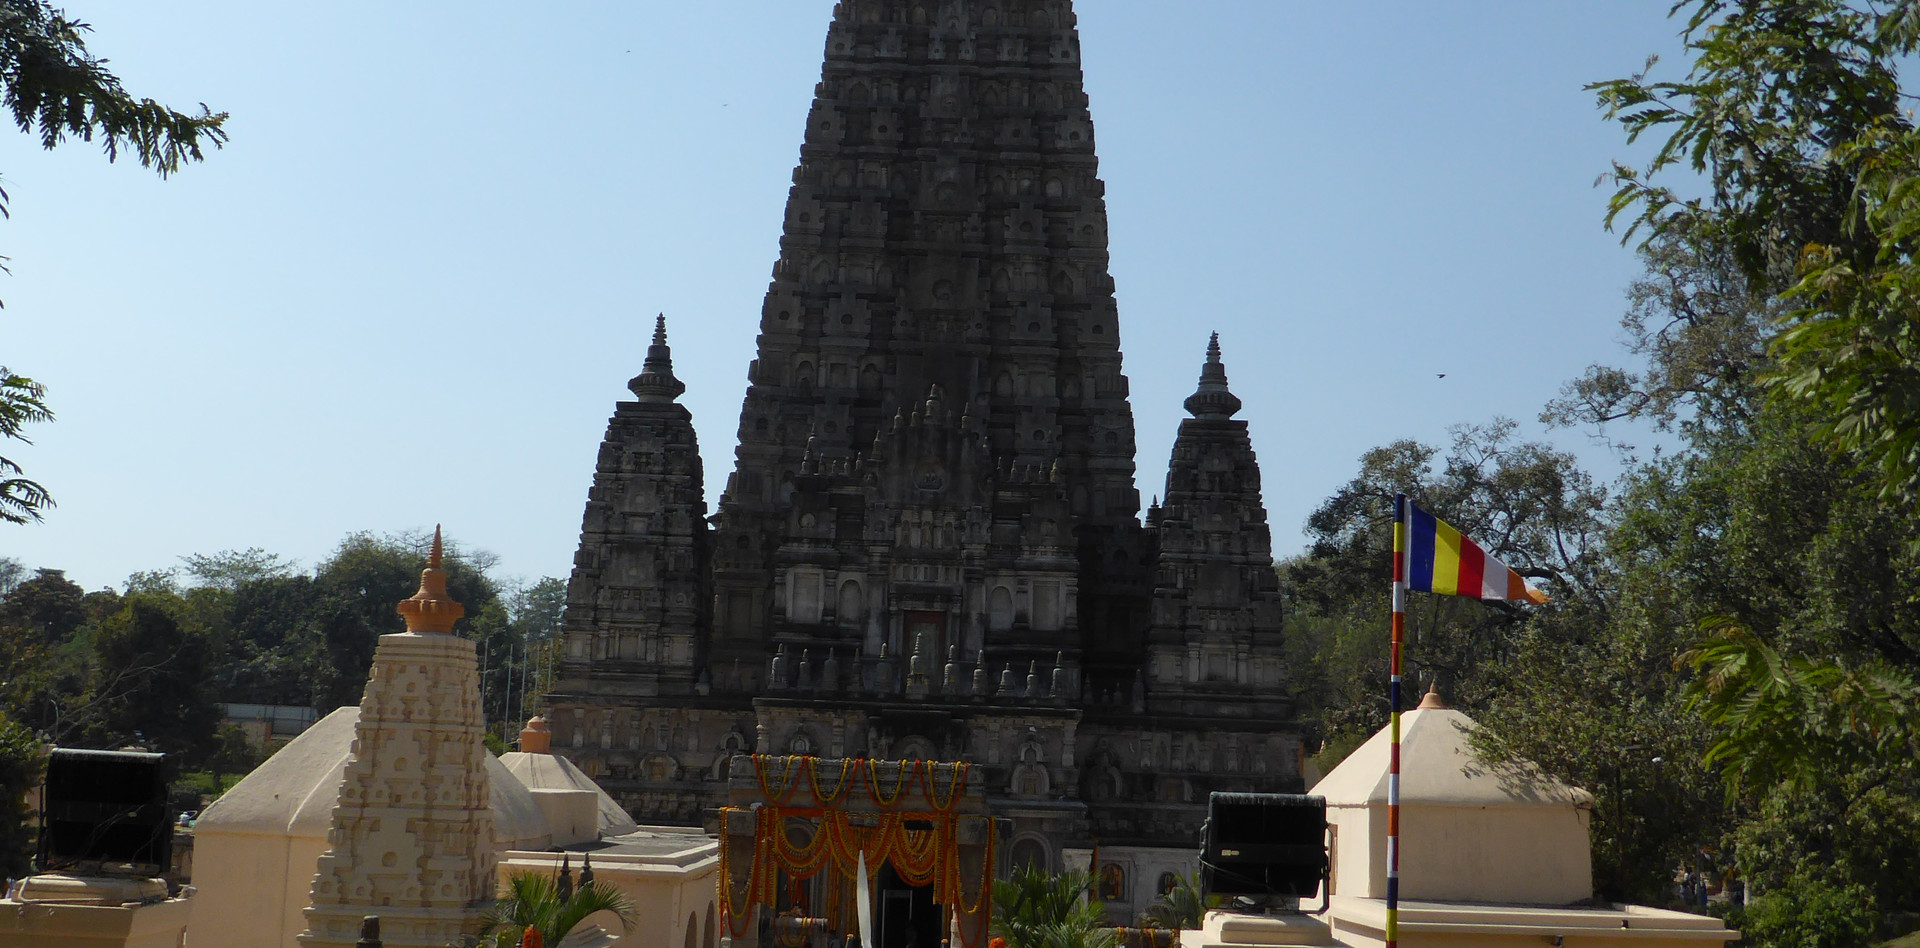 The main Stupa in Bodhgaya